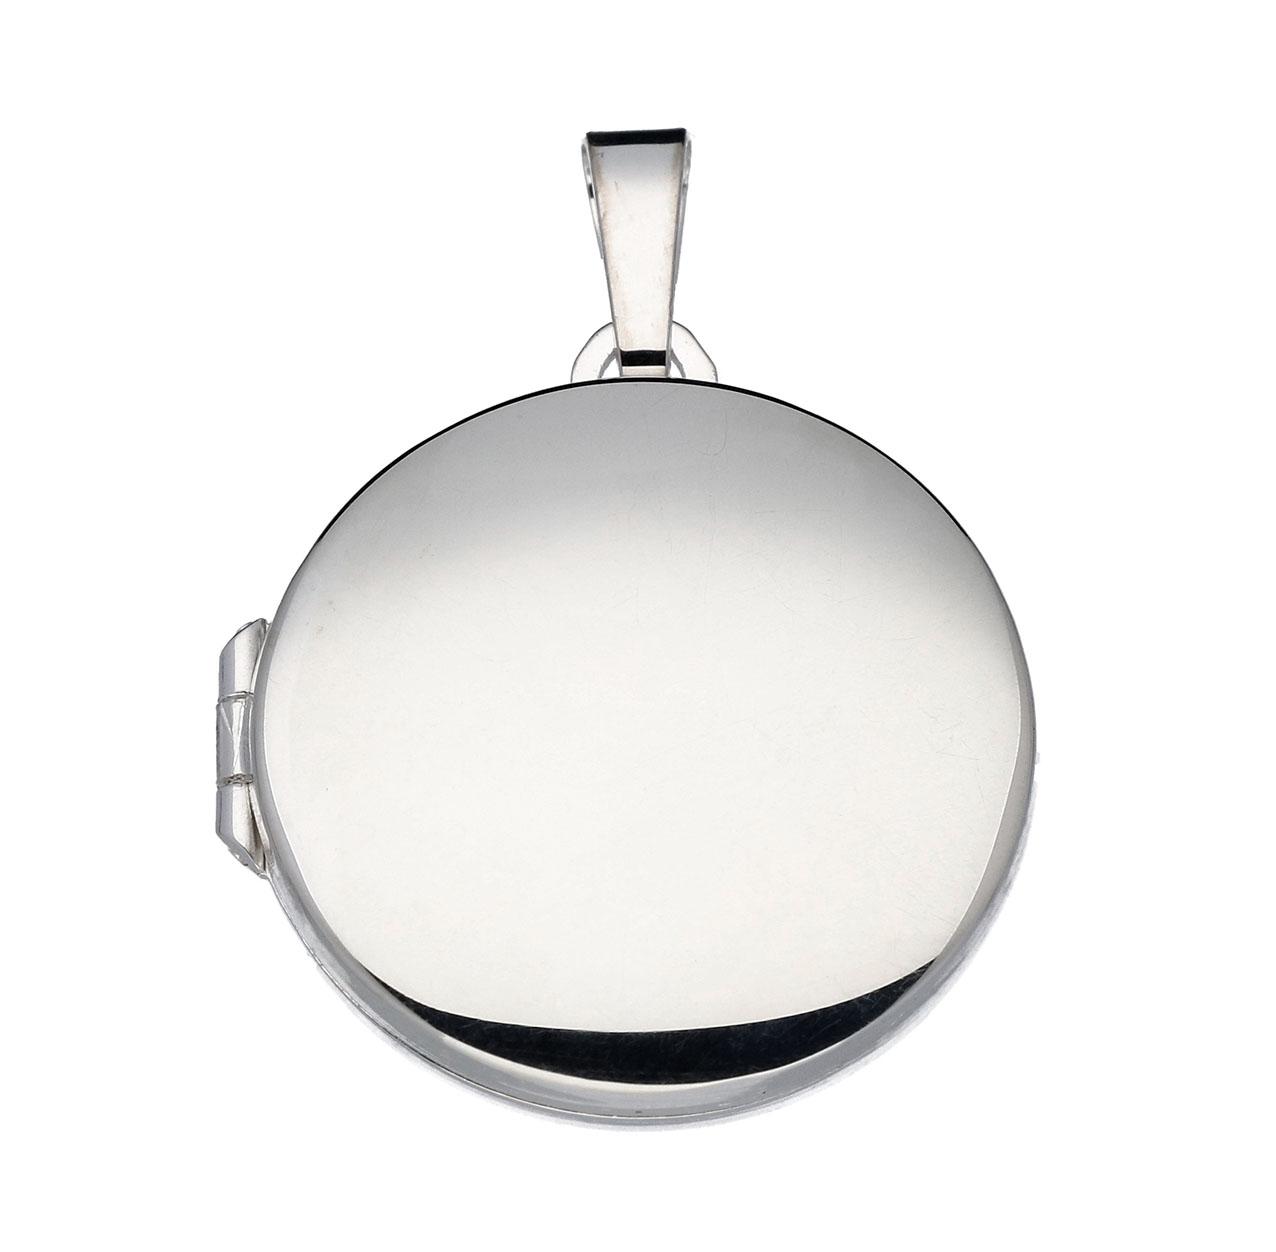 Zilveren Medaillon Rond glad - 22 mm 145.0041.00